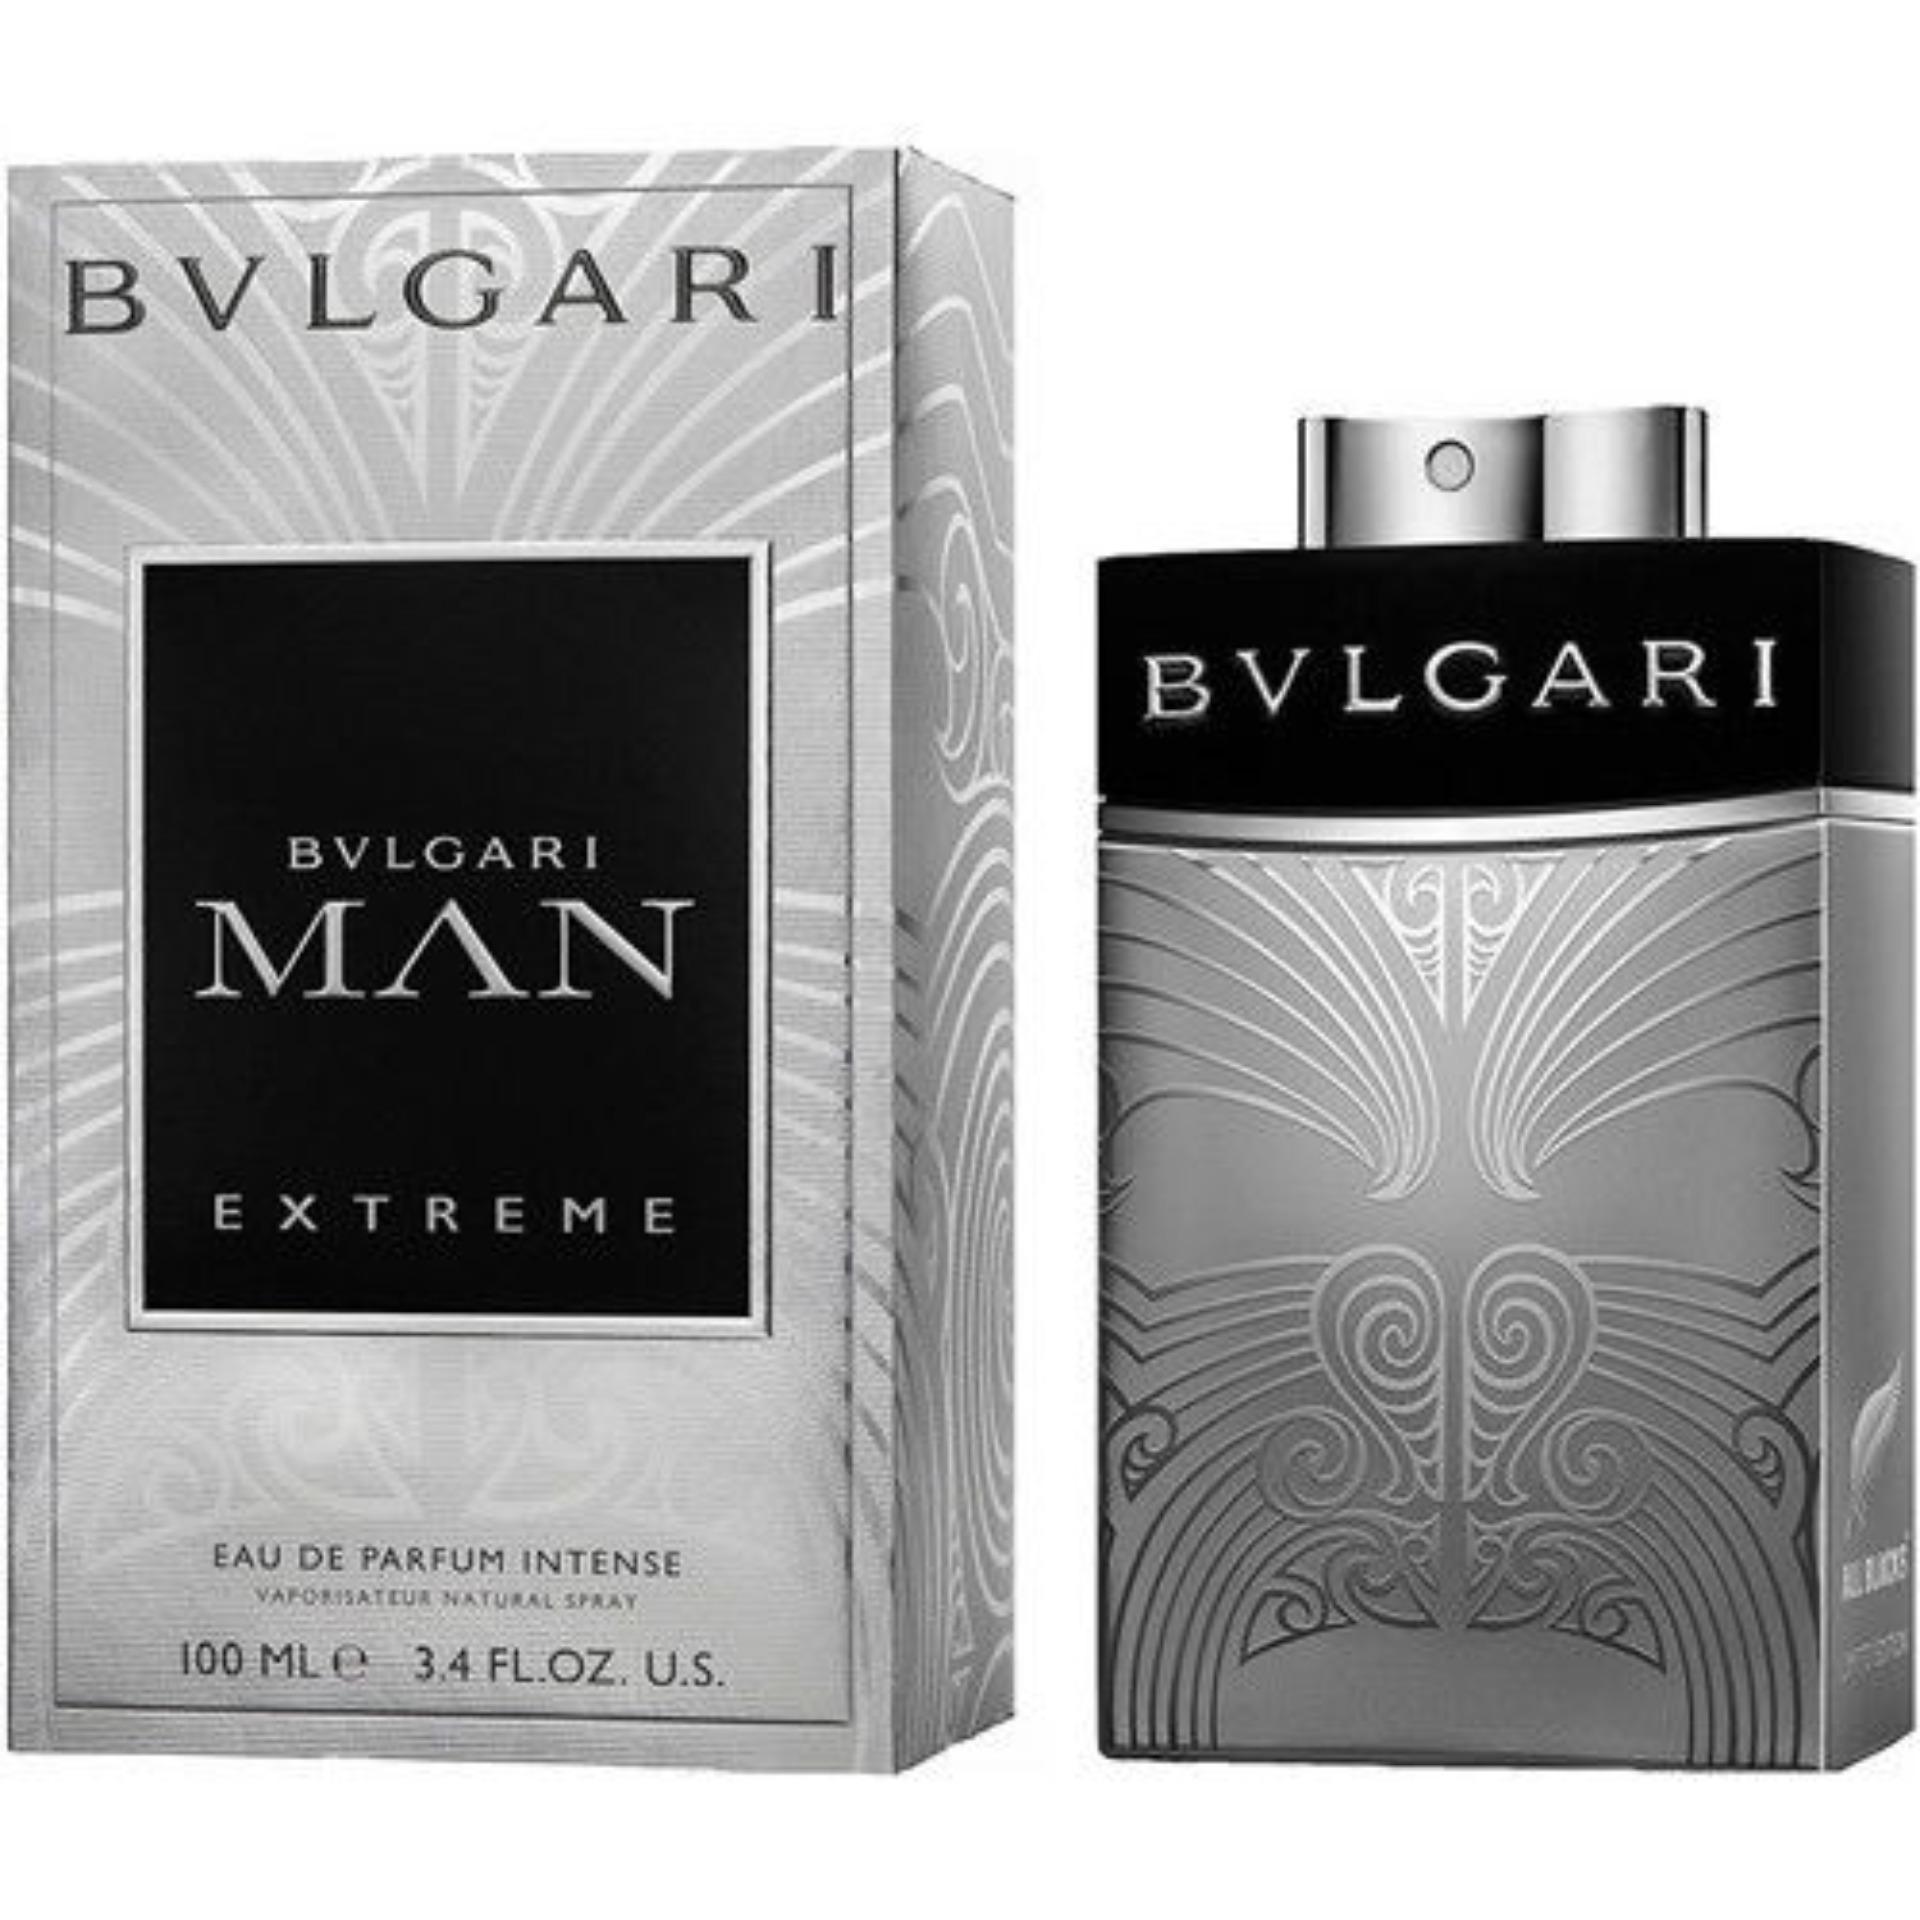 Bvlgari Philippines Fragrances For Sale Prices Reviews Omnia Amethyste 65 Ml Non Box Man Extreme All Black Editions By Men Eau De Parfum 100ml